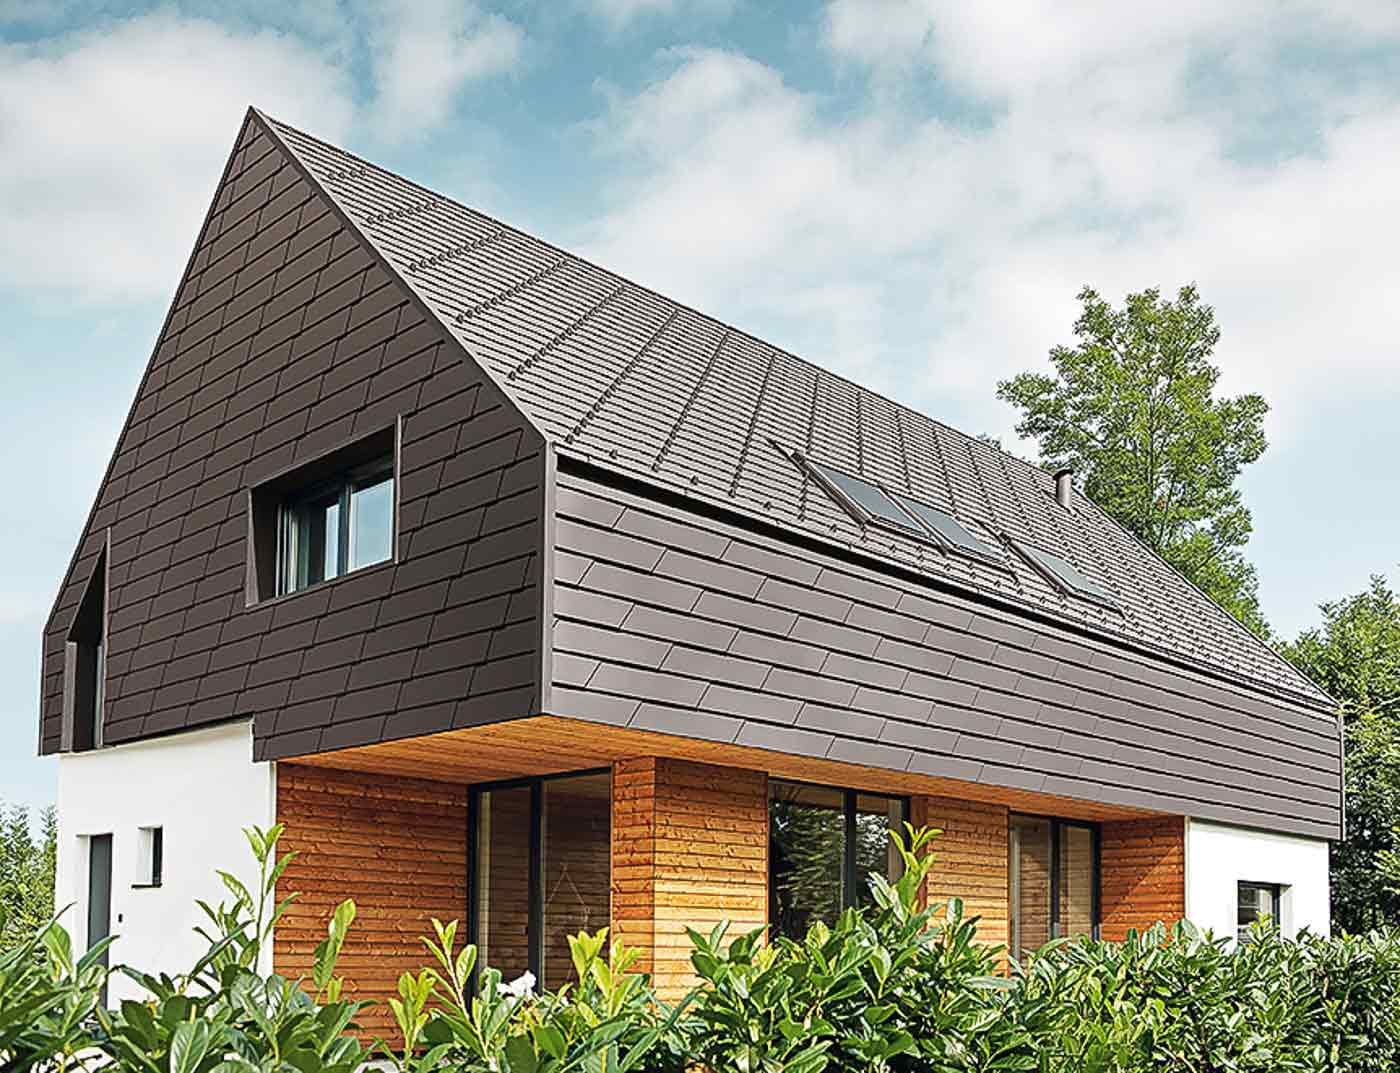 xl fa ade shingle prefa. Black Bedroom Furniture Sets. Home Design Ideas